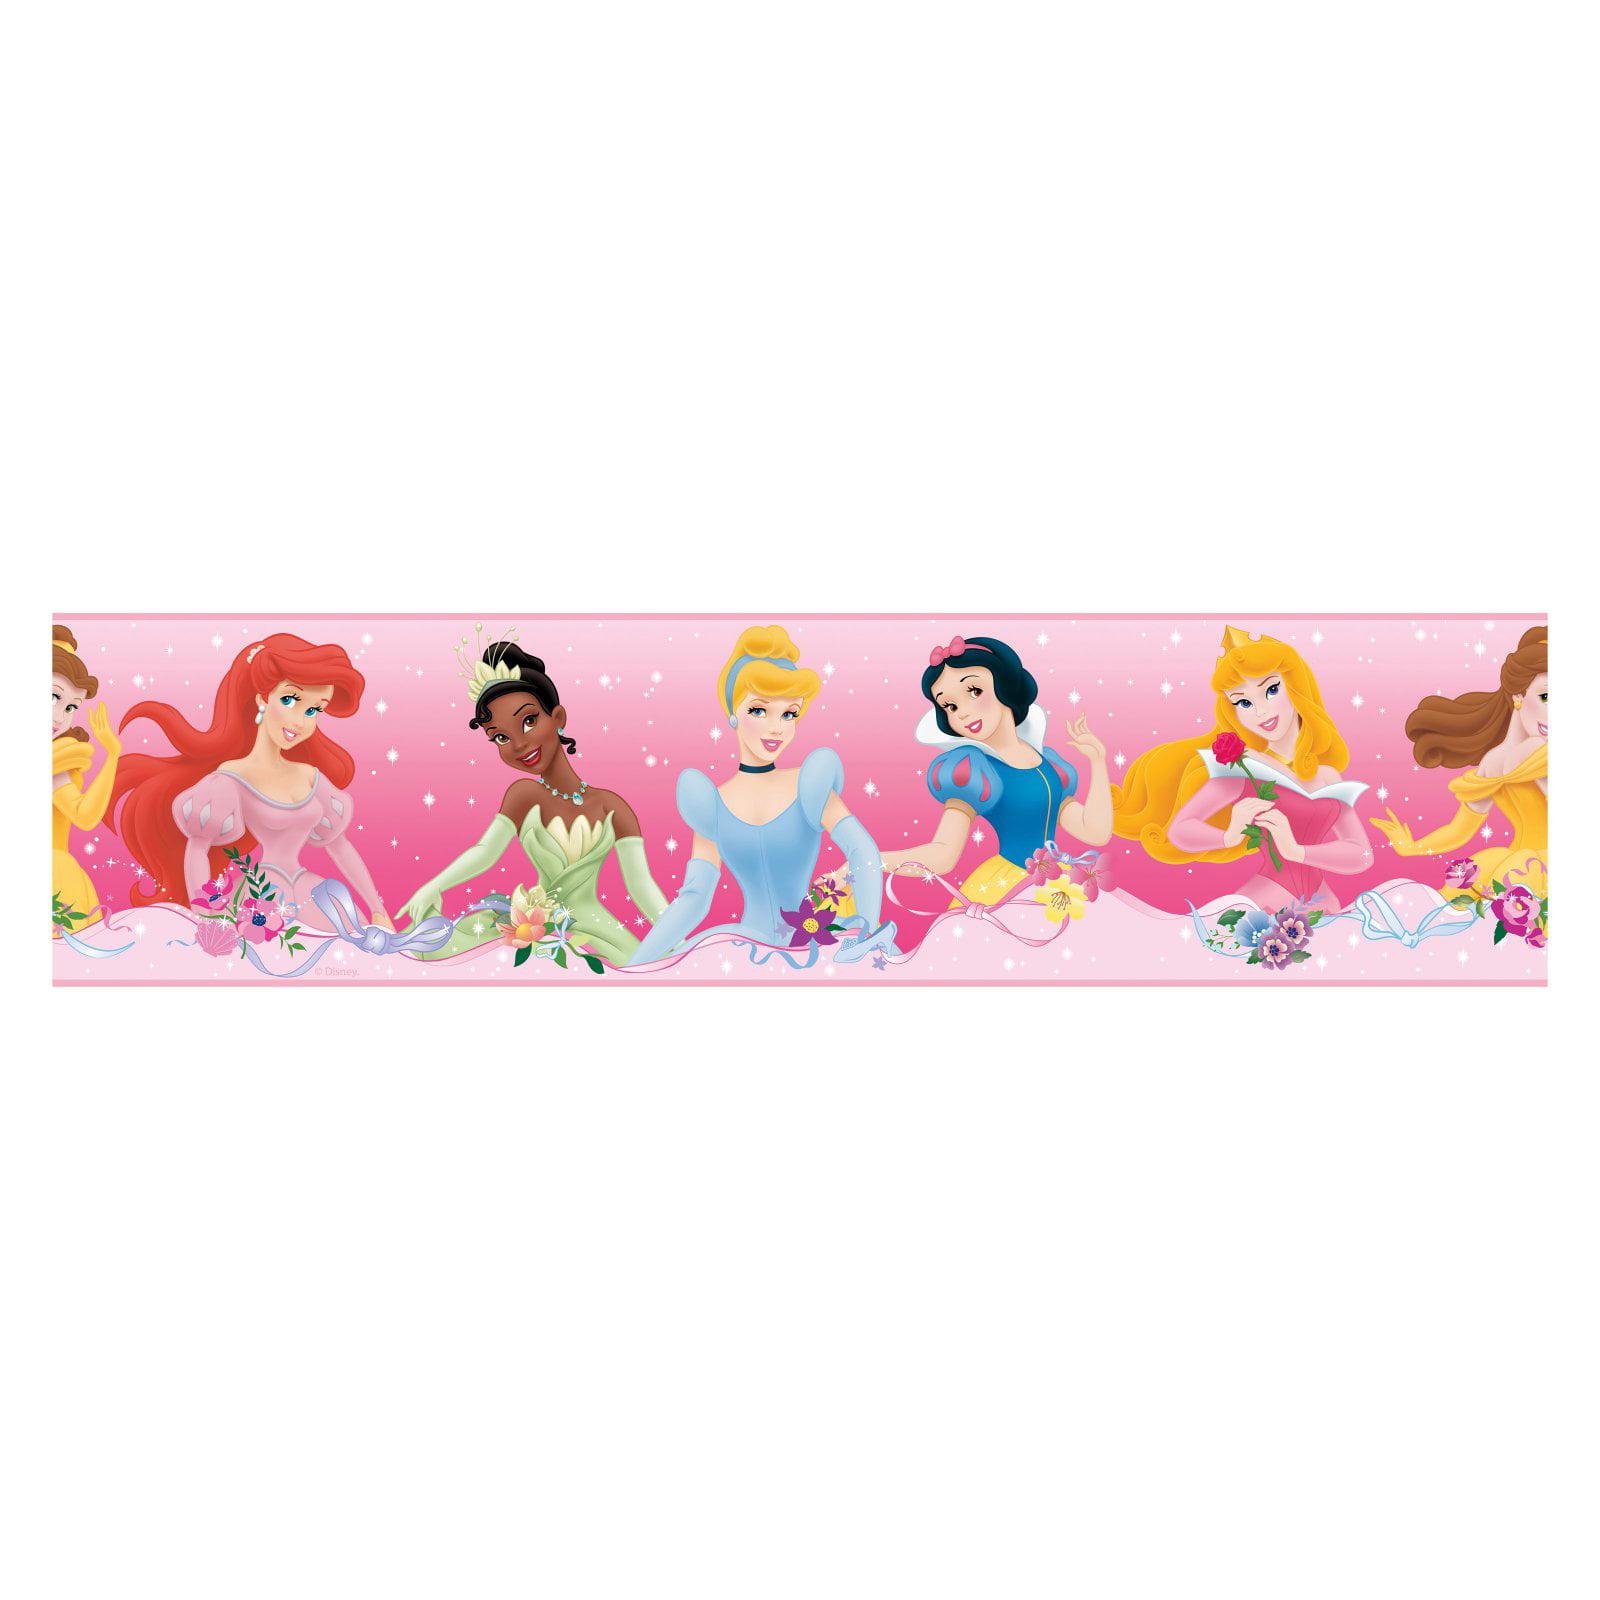 RoomMates Disney Princess Dream from the Heart Purple Peel and Stick Border